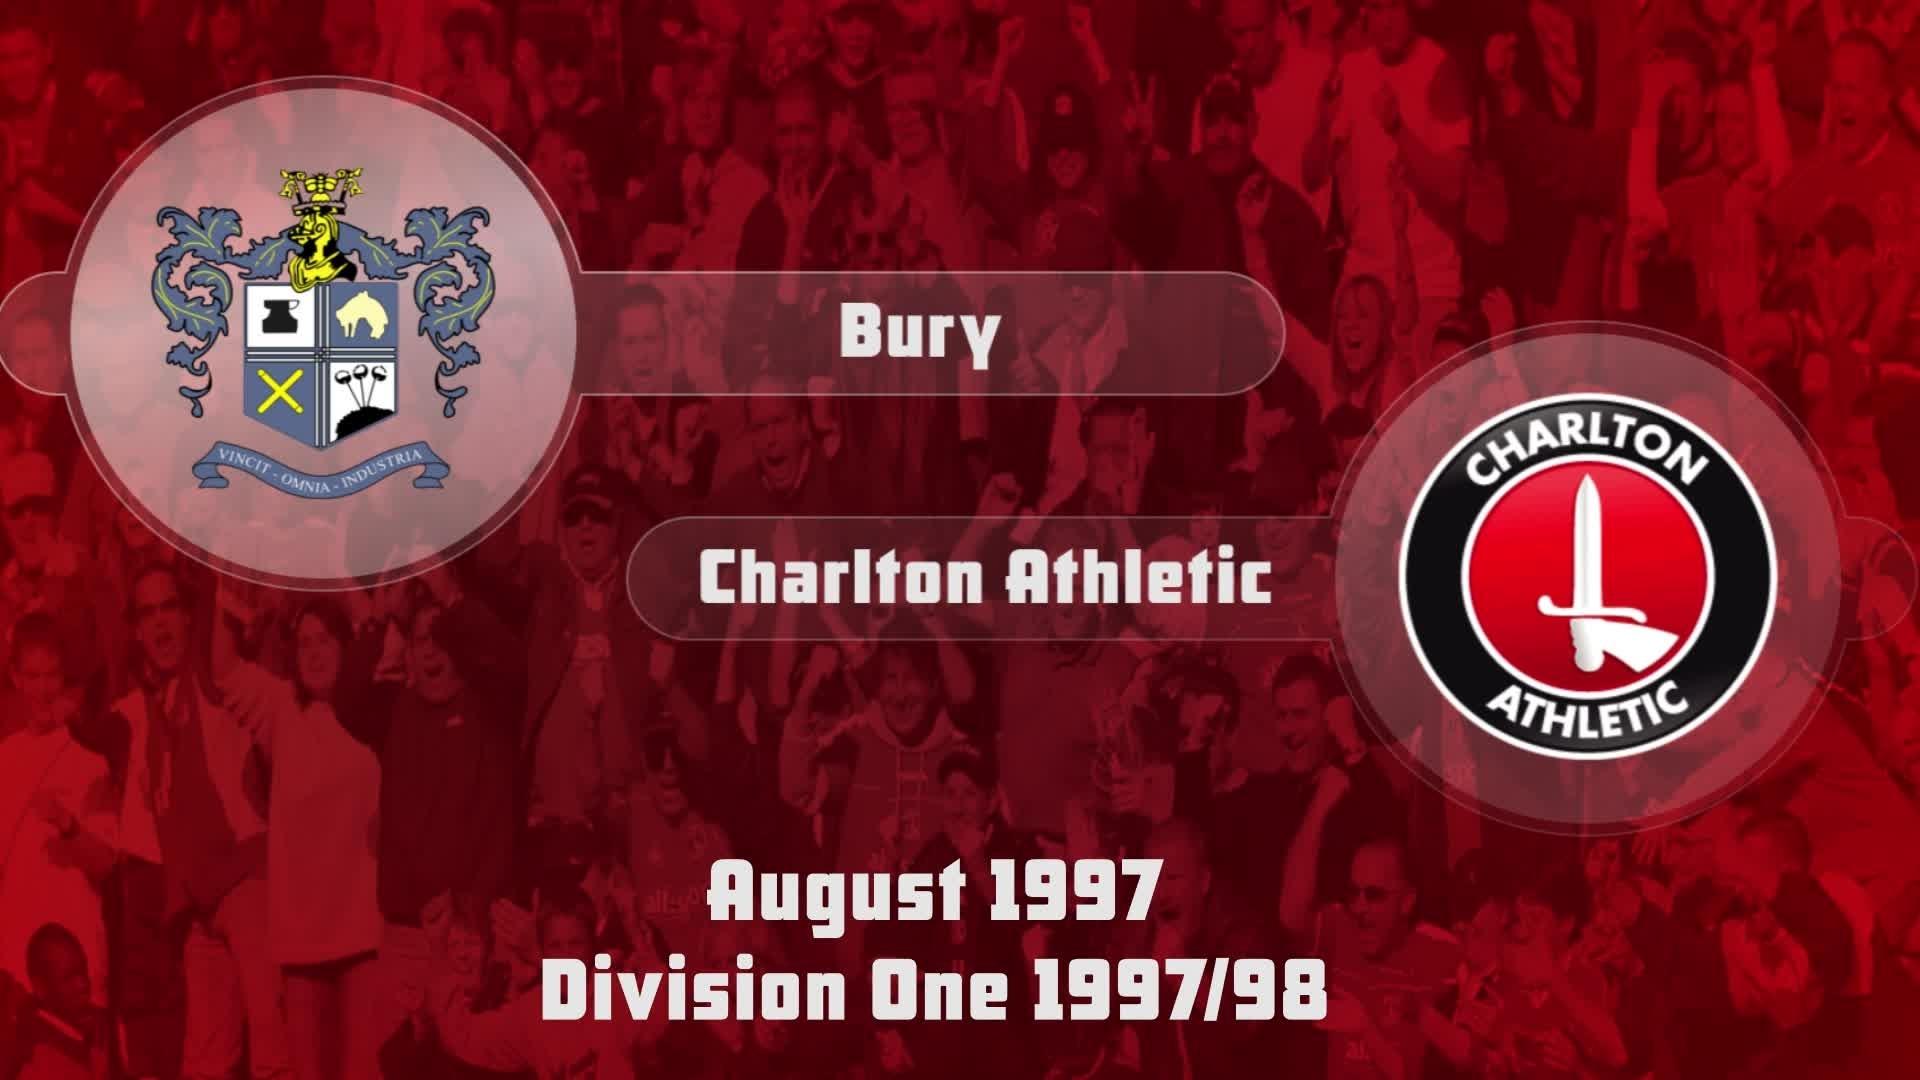 04 HIGHLIGHTS | Bury 0 Charlton 0 (Aug 1997)